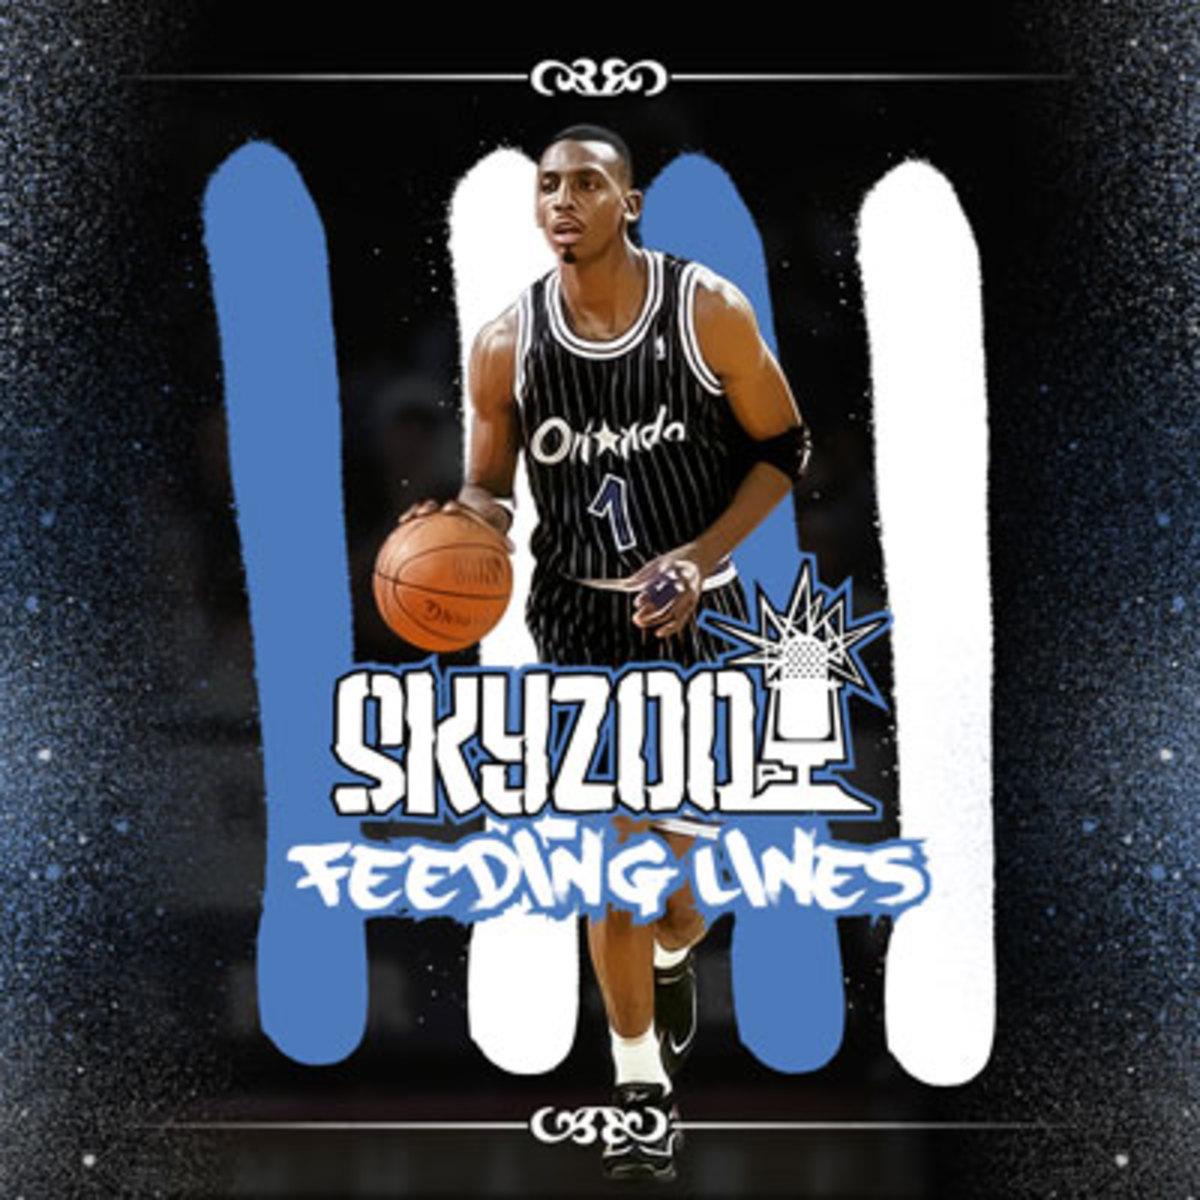 skyzoo-feedinglines.jpg